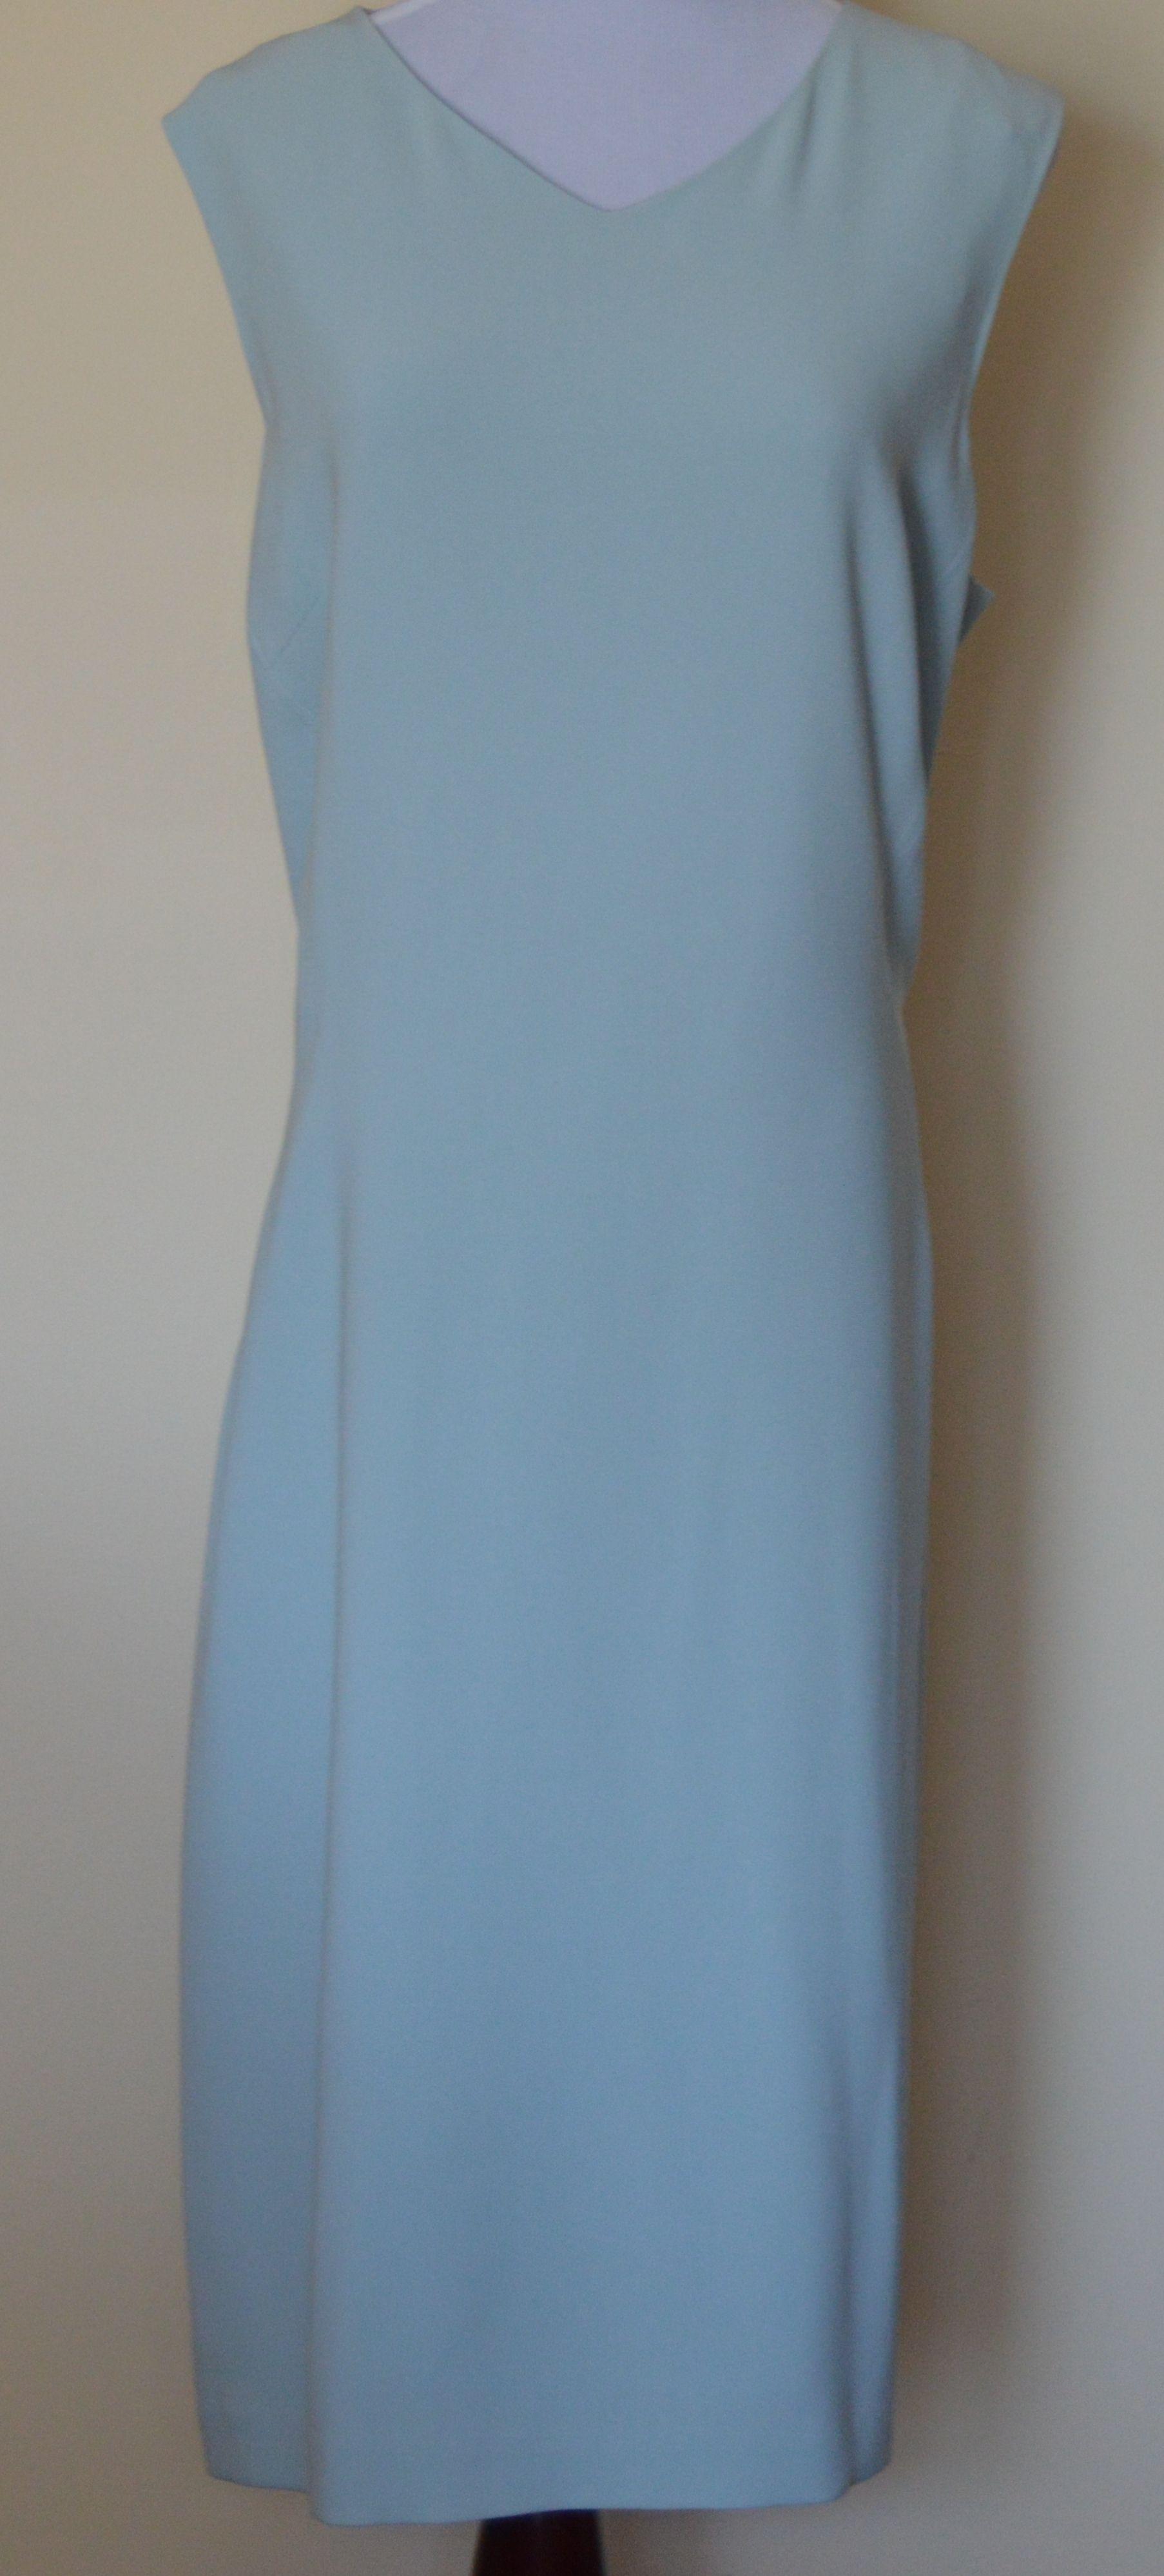 Talbots dresses for weddings  Talbots  Woven Matte Jersey Dress  Glacier Mint  Dianeus Dresses